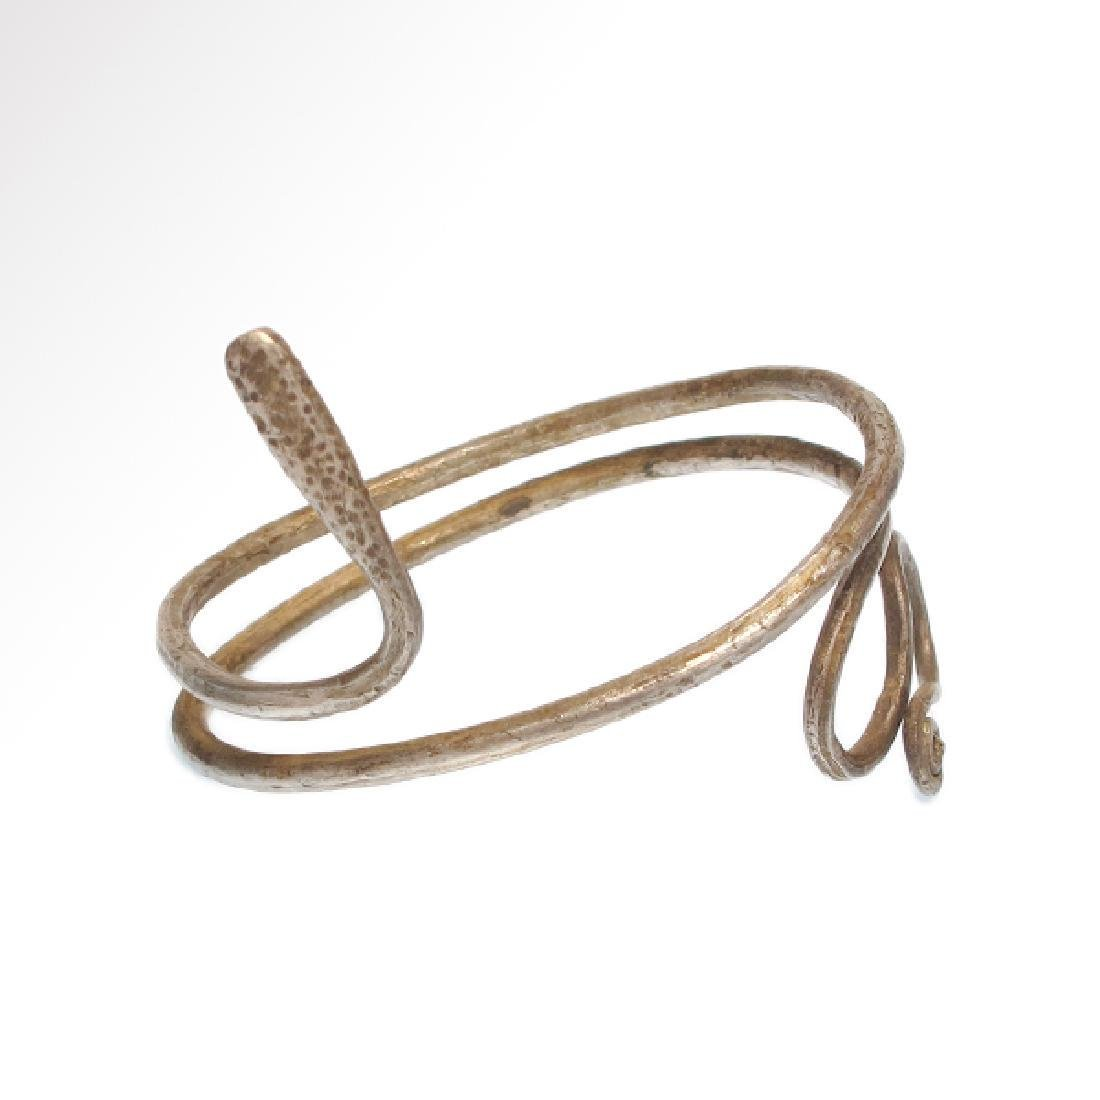 Roman Silver Snake Bracelet, C. 2nd Century AD